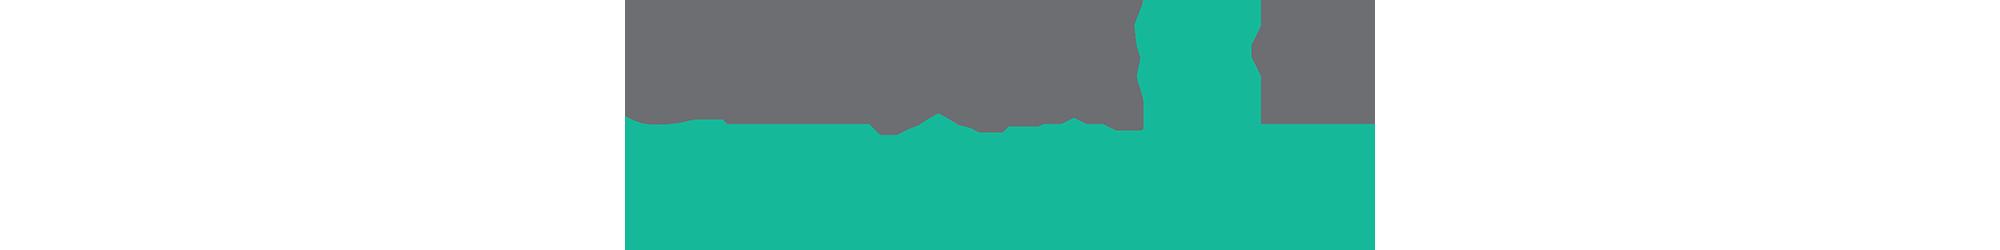 jenkin-design-logo-1500x500Artboard-1.png